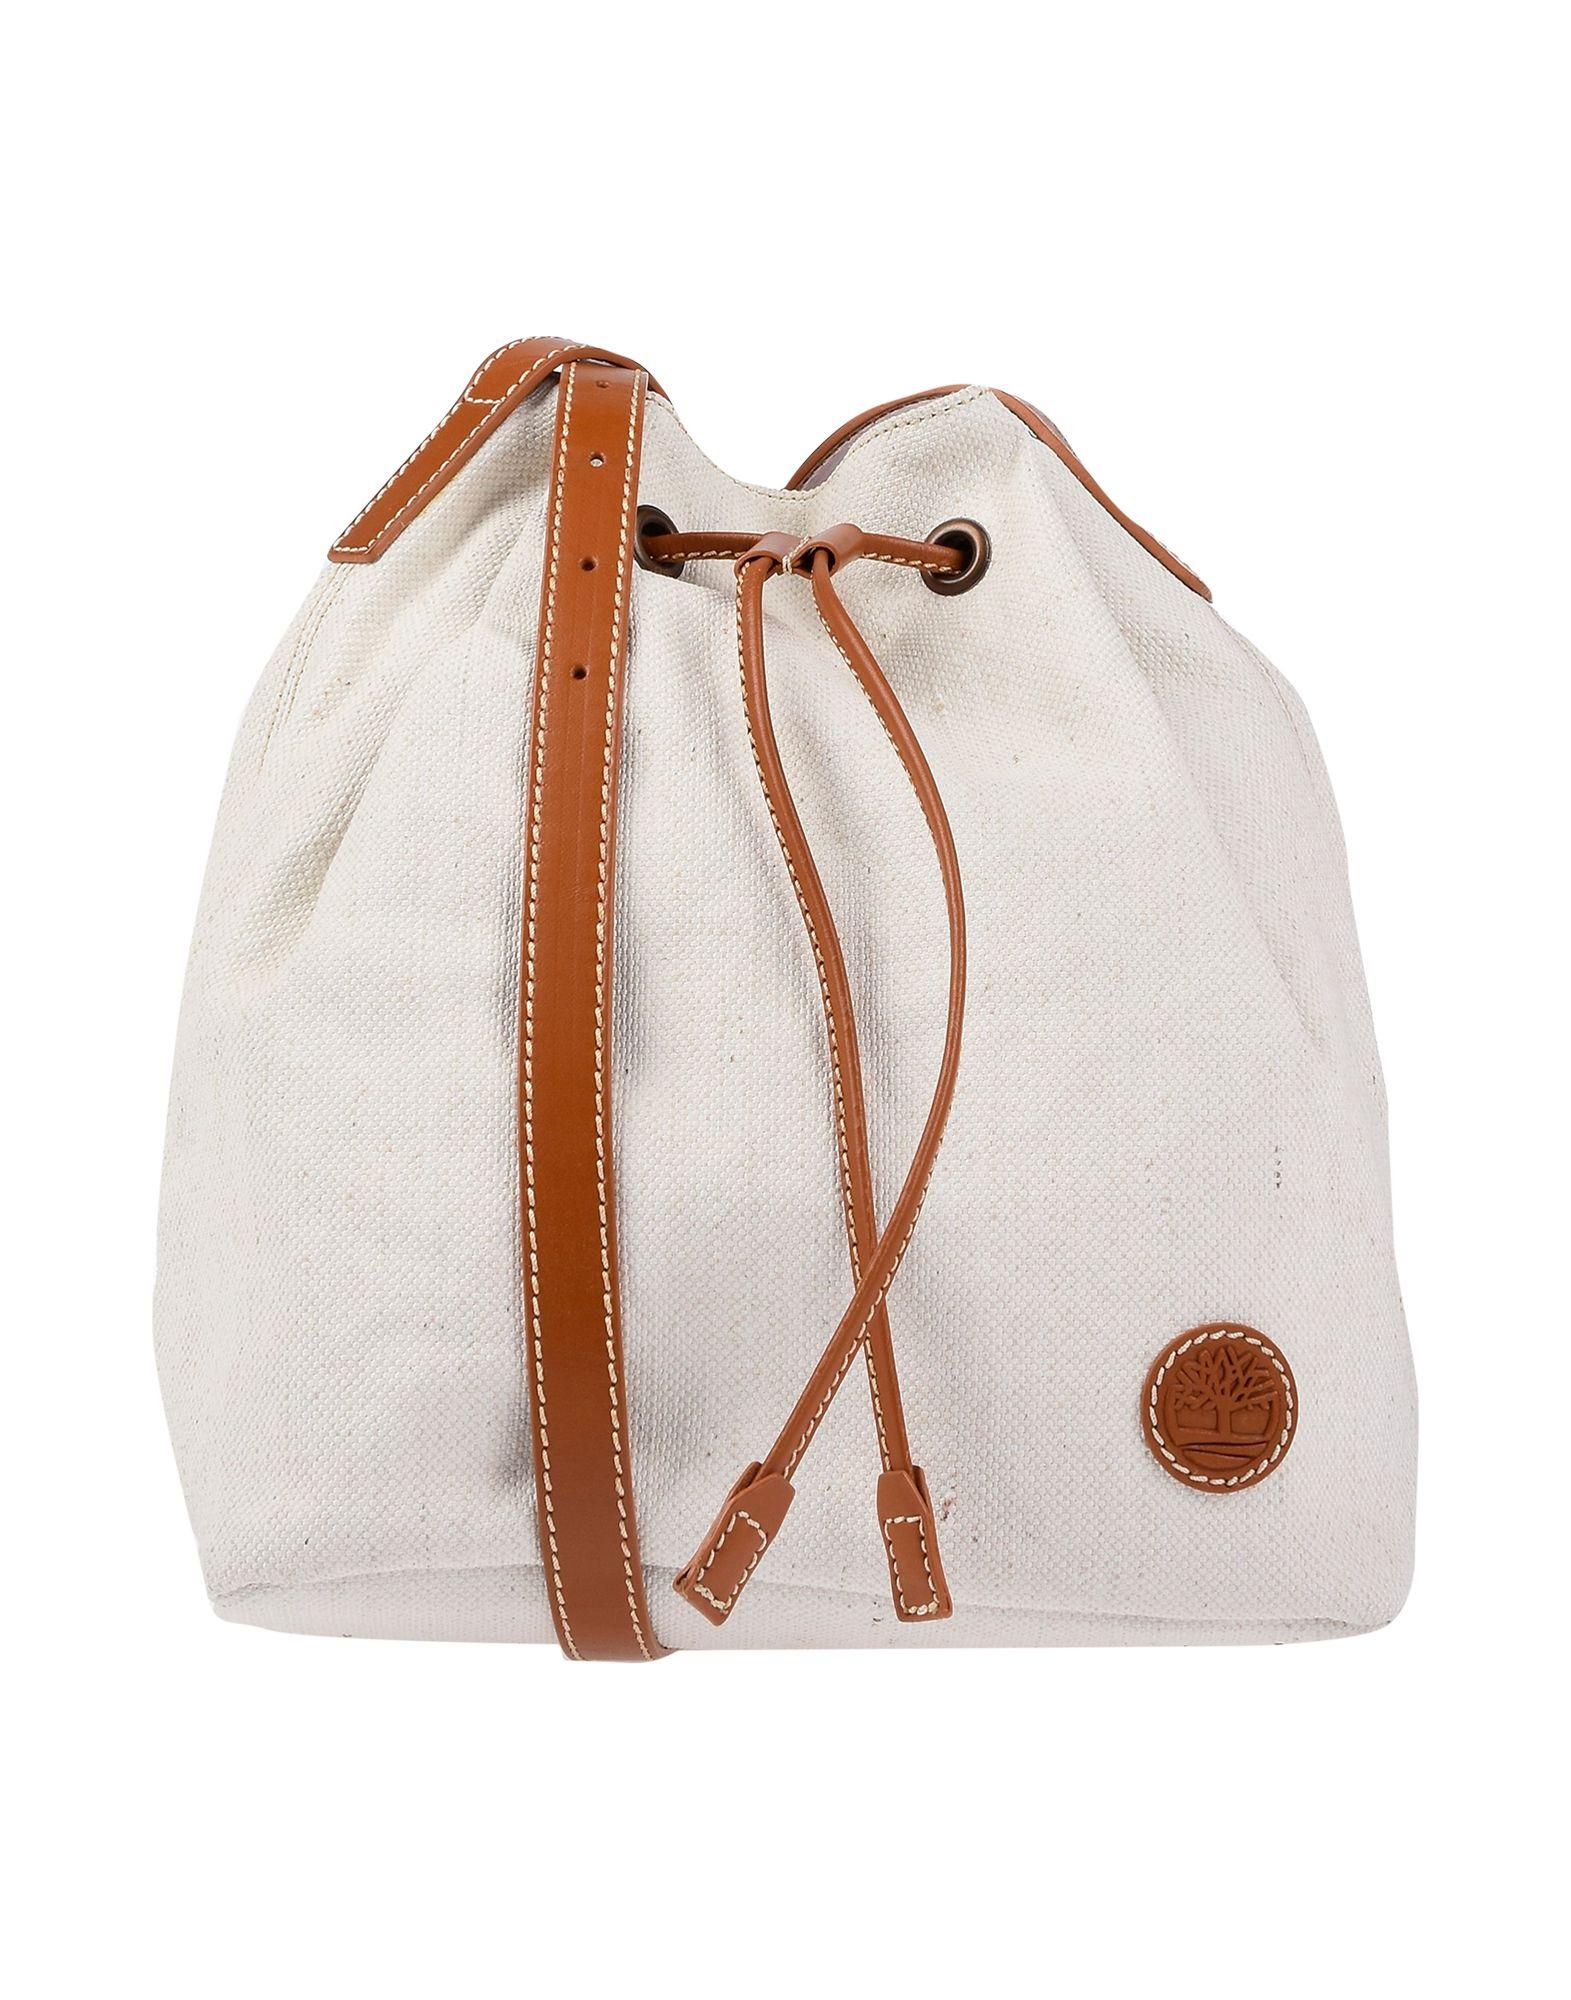 TIMBERLAND Сумка через плечо сумка через плечо anais gvani croco ag 1471 350161